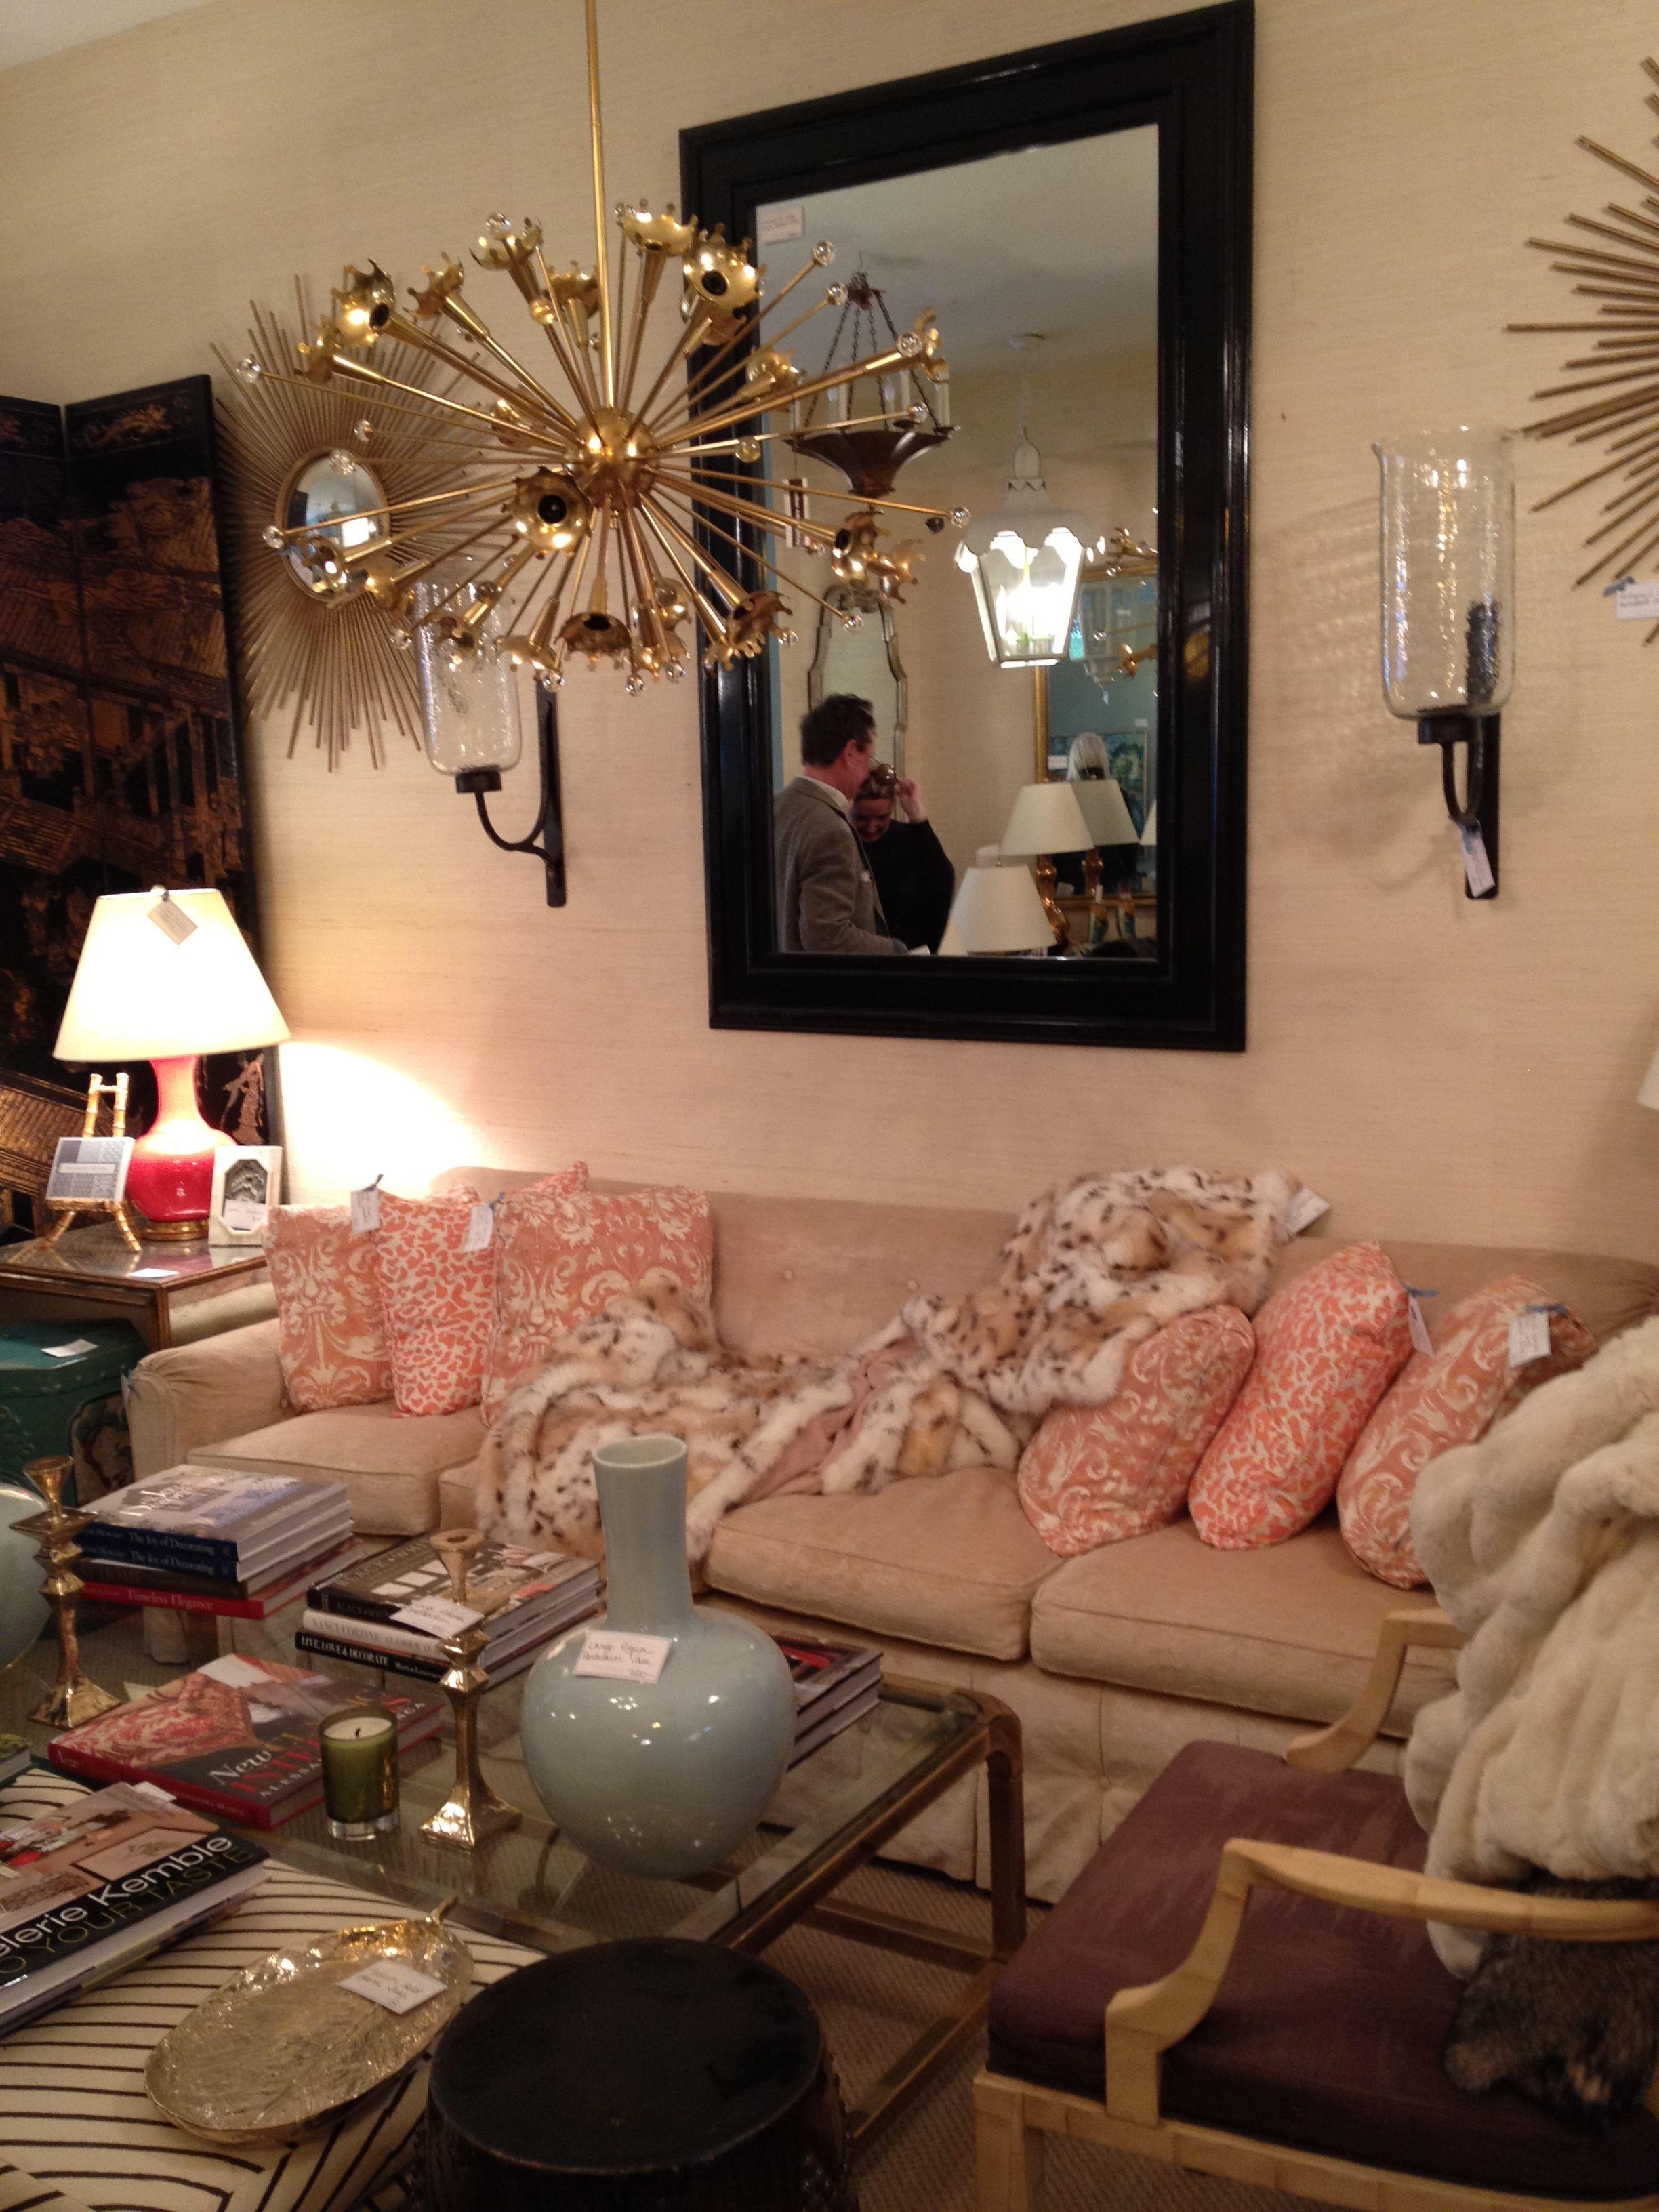 eclectic lighting. Eclectic Living Room - Decor -lighting, Sofa, Pillows, Fur Throw Lighting